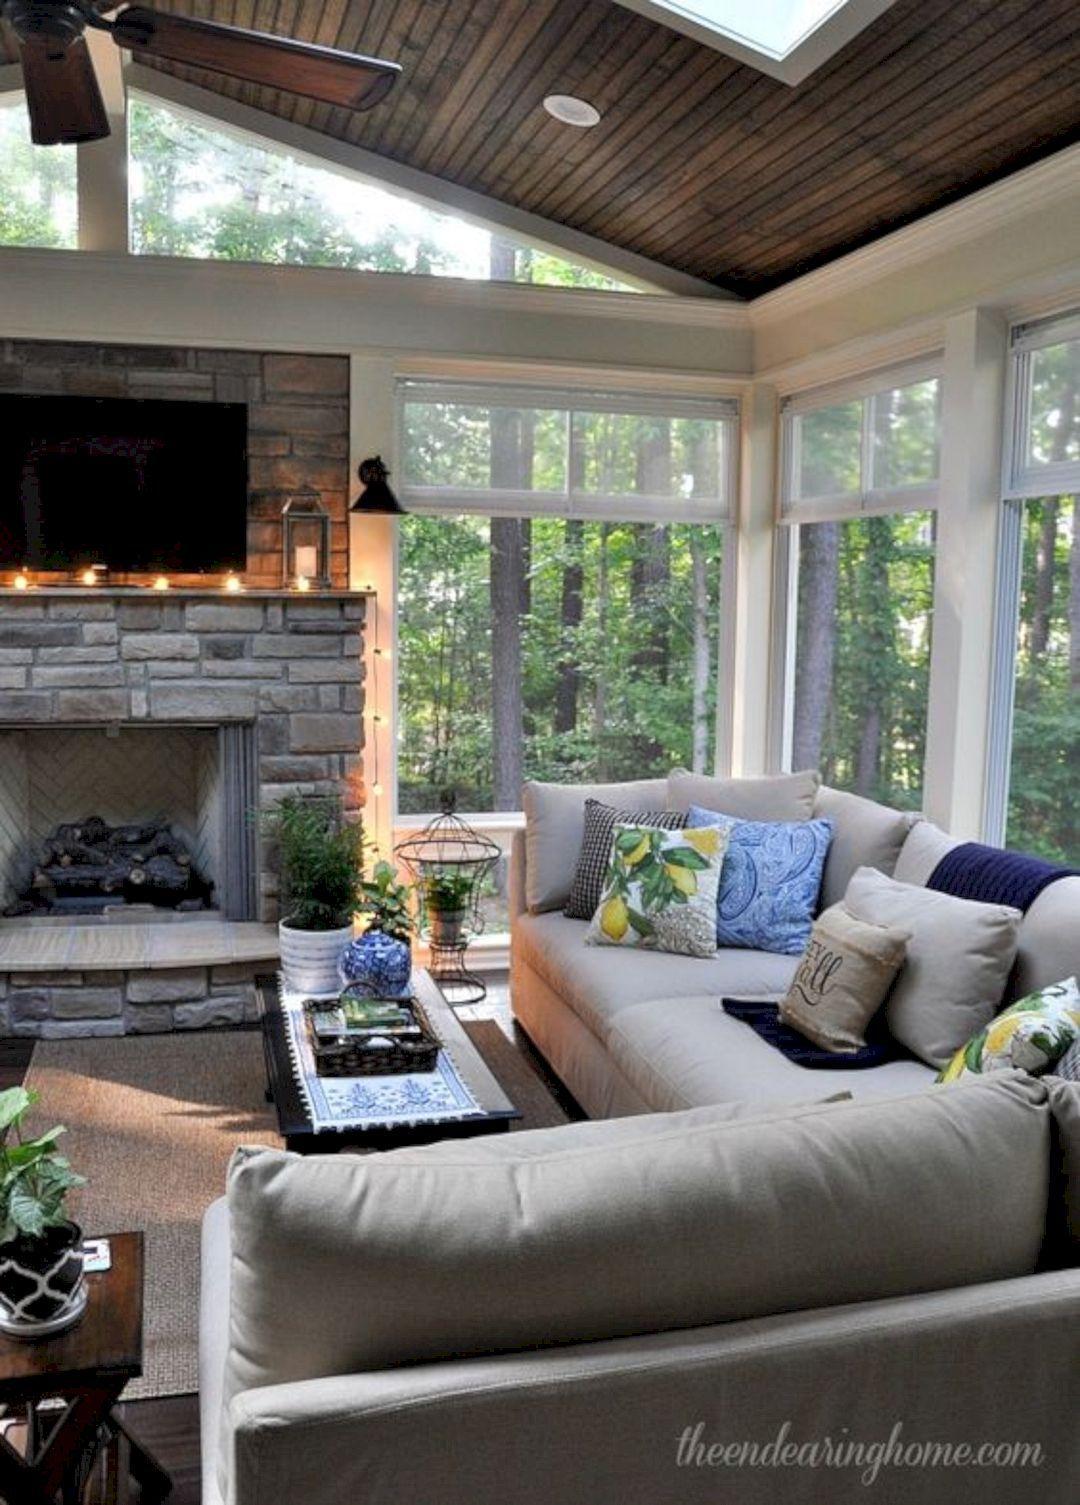 16 Furniture Ideas to Brighten Your Sunroom Furniture